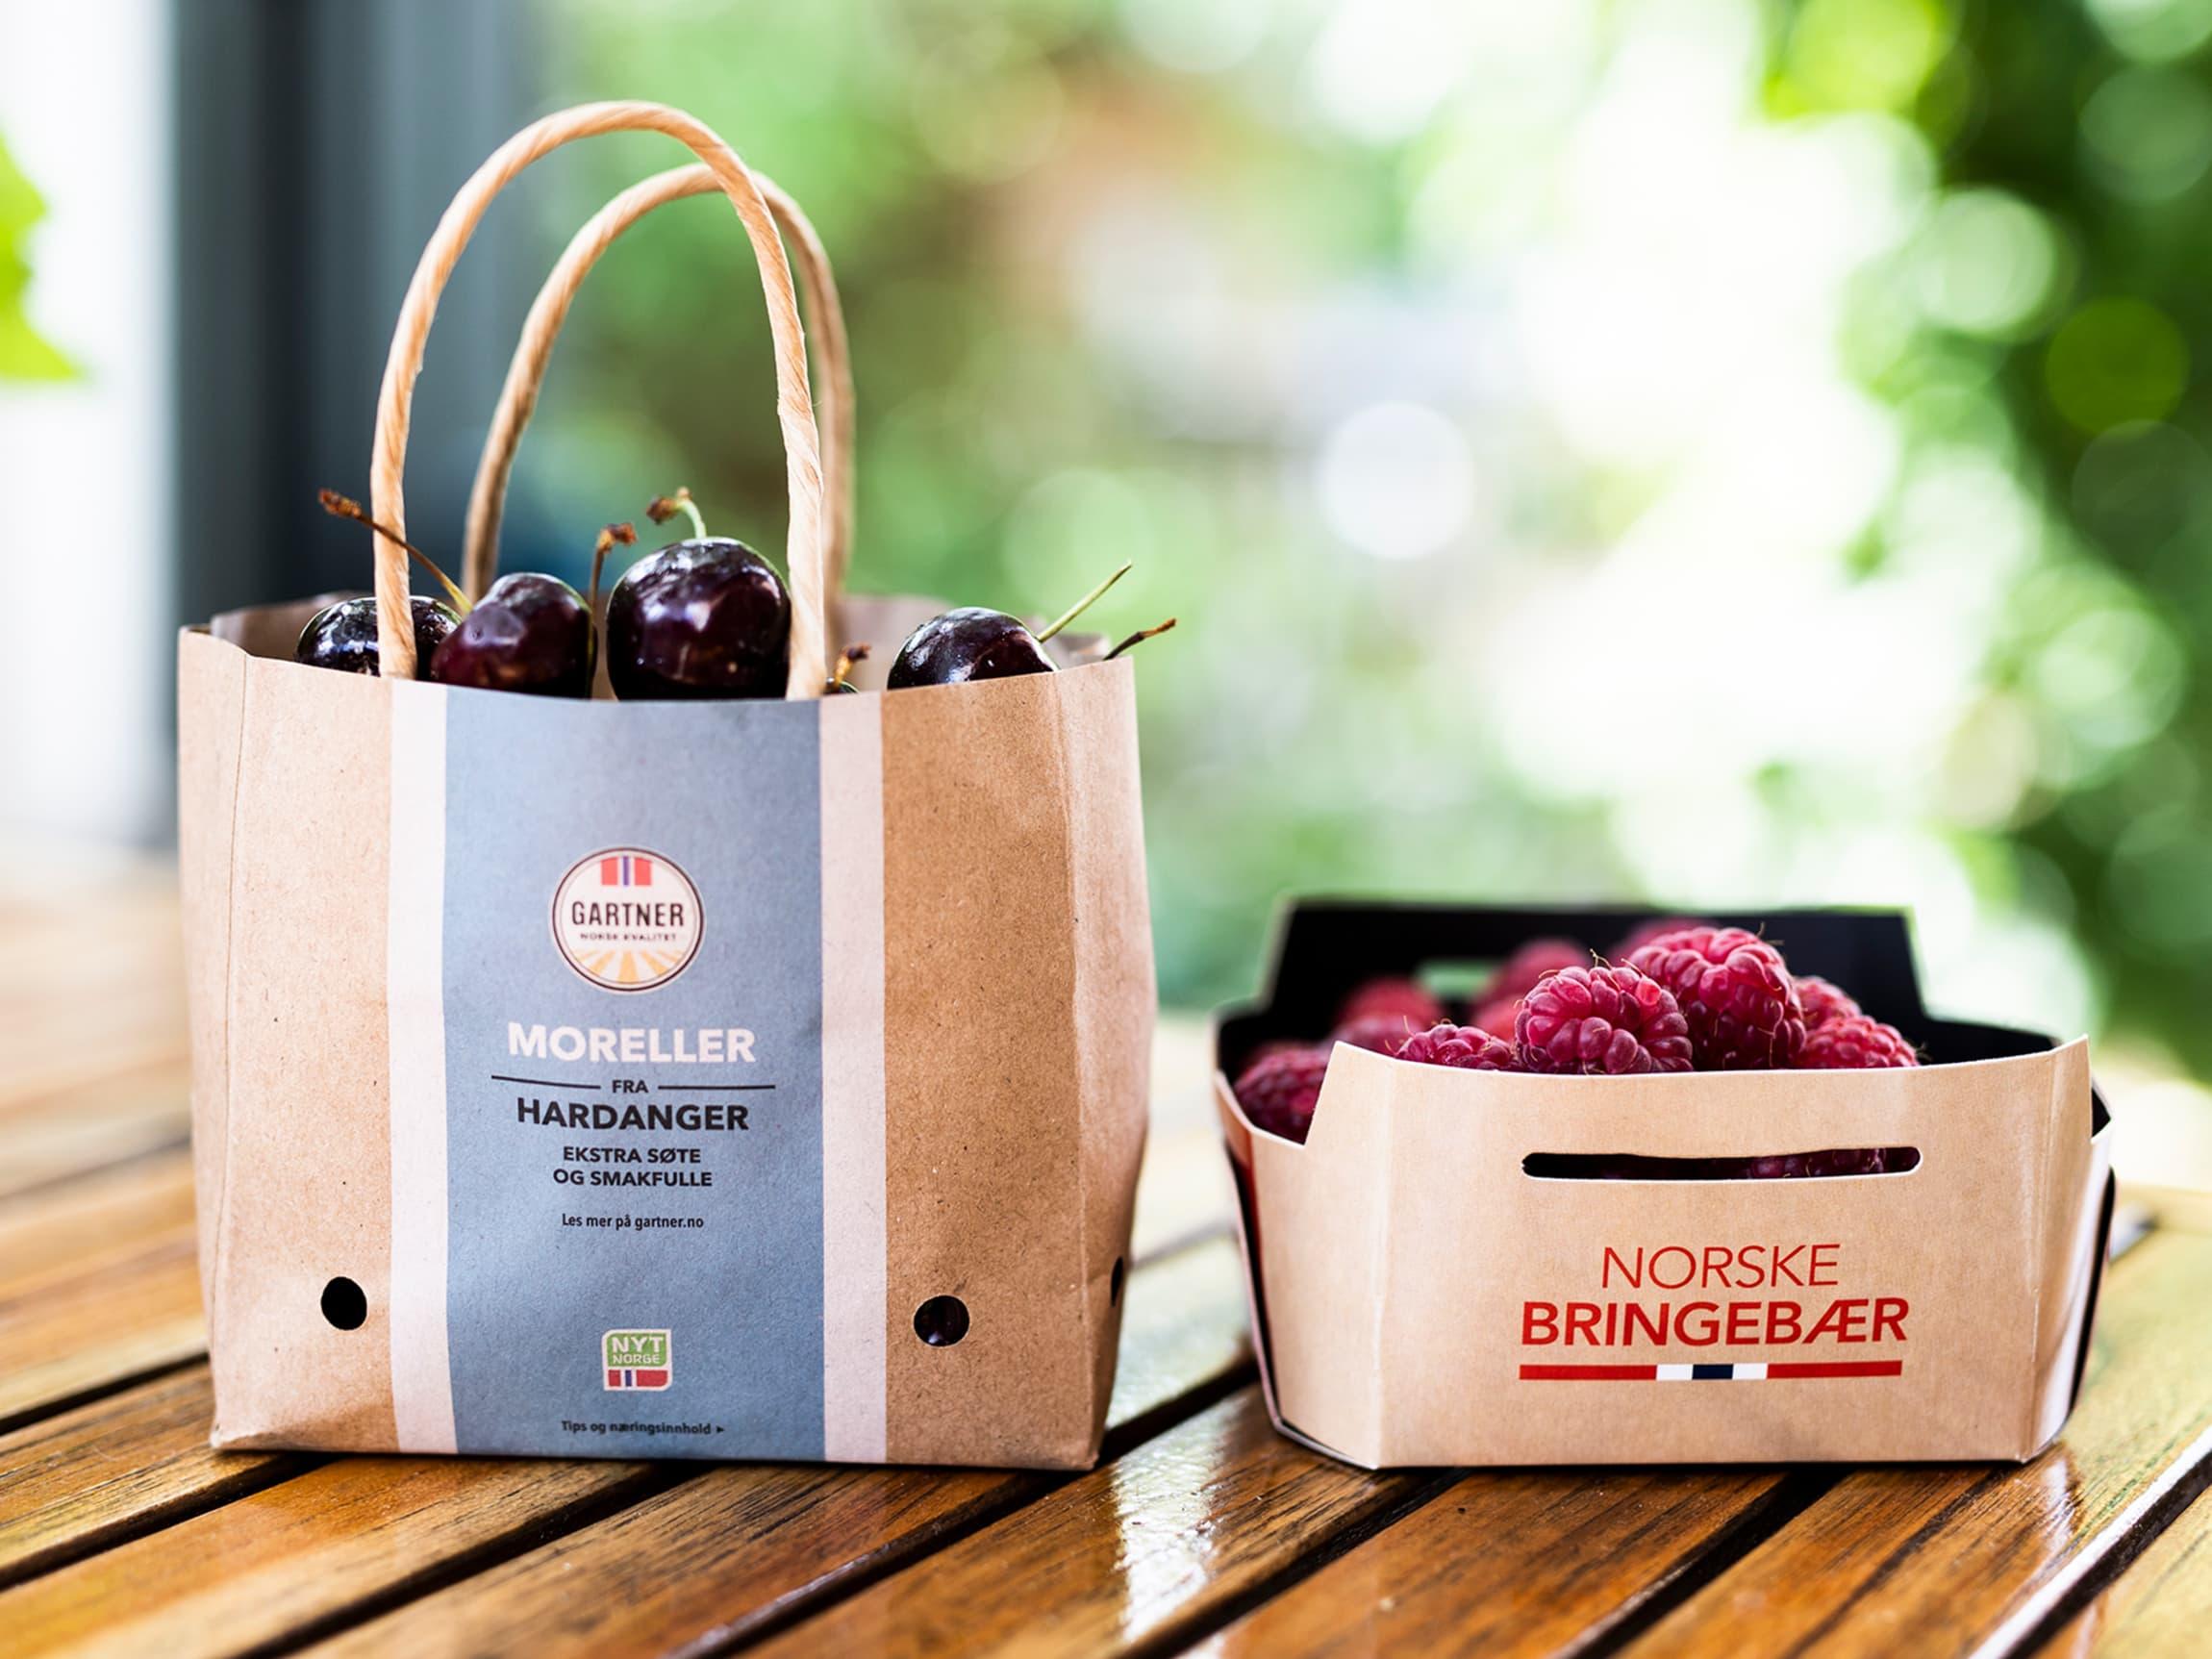 Fra sommeren 2018 har vi byttet til løsvekt der det er mulig for frukt og bær, samt byttet ut plast med papp der det er et godt alternativ.